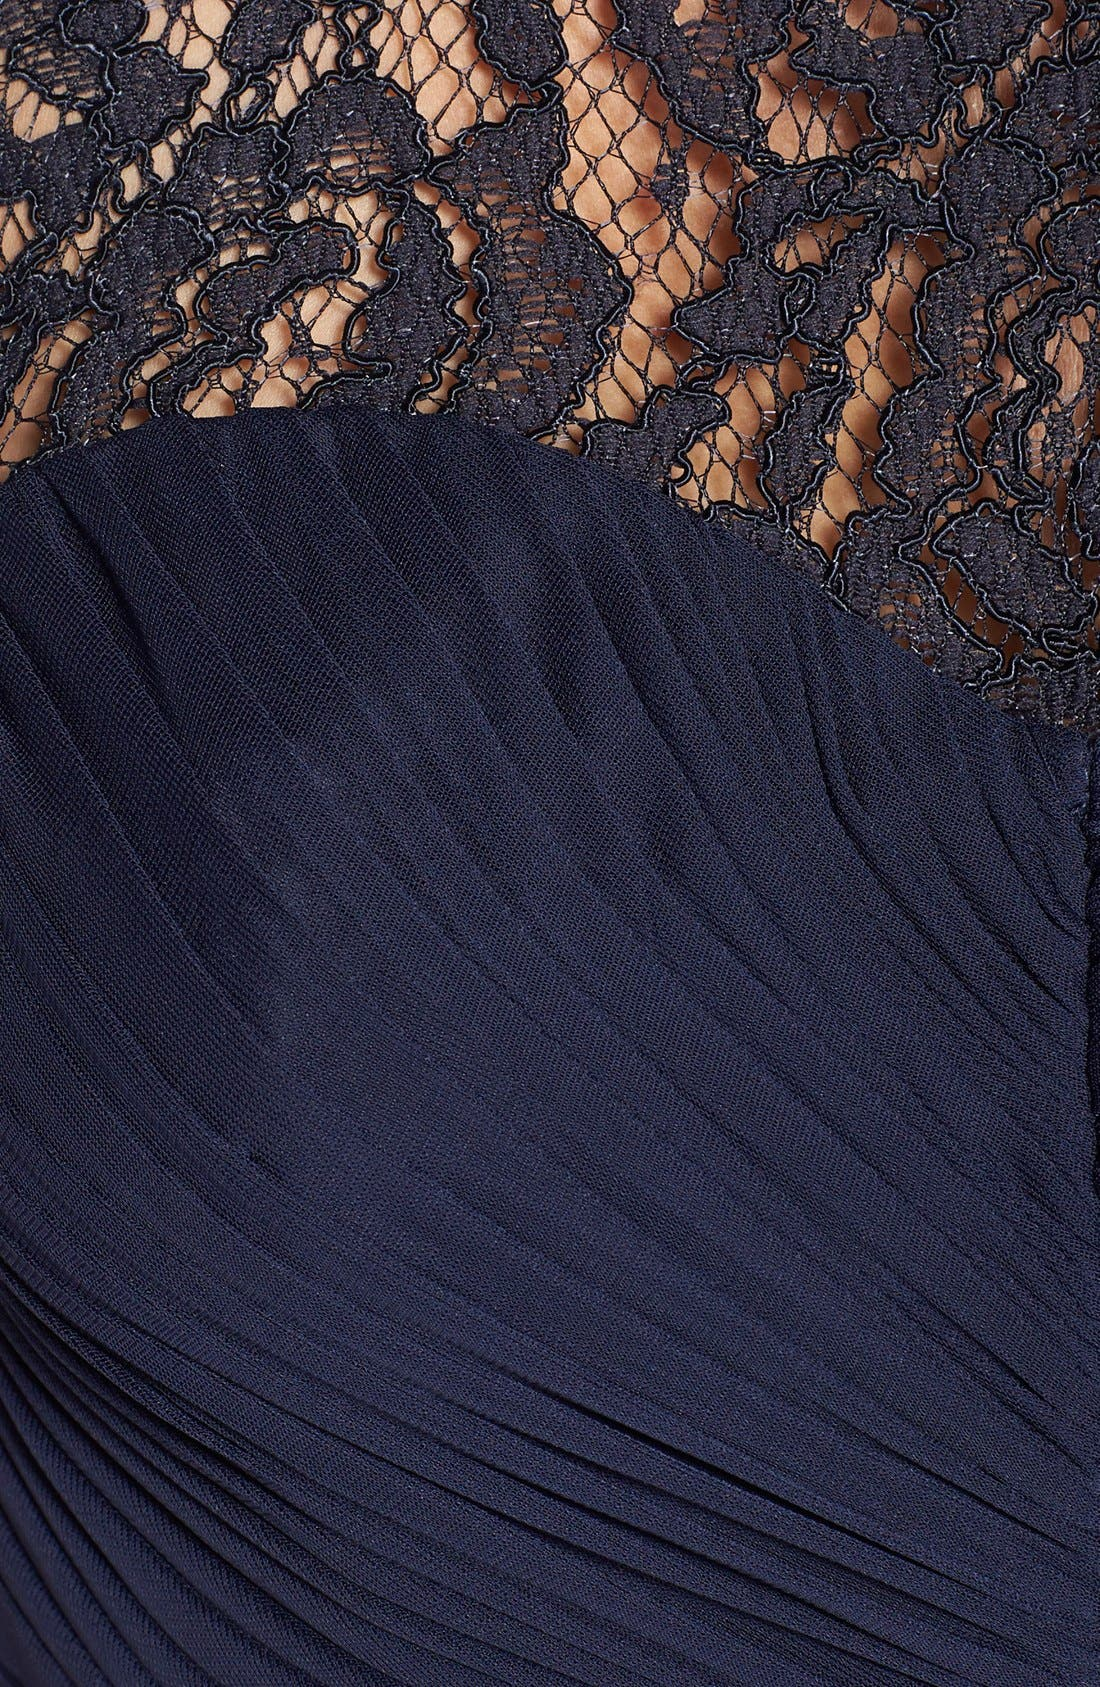 Lace Yoke Drape Gown,                             Alternate thumbnail 18, color,